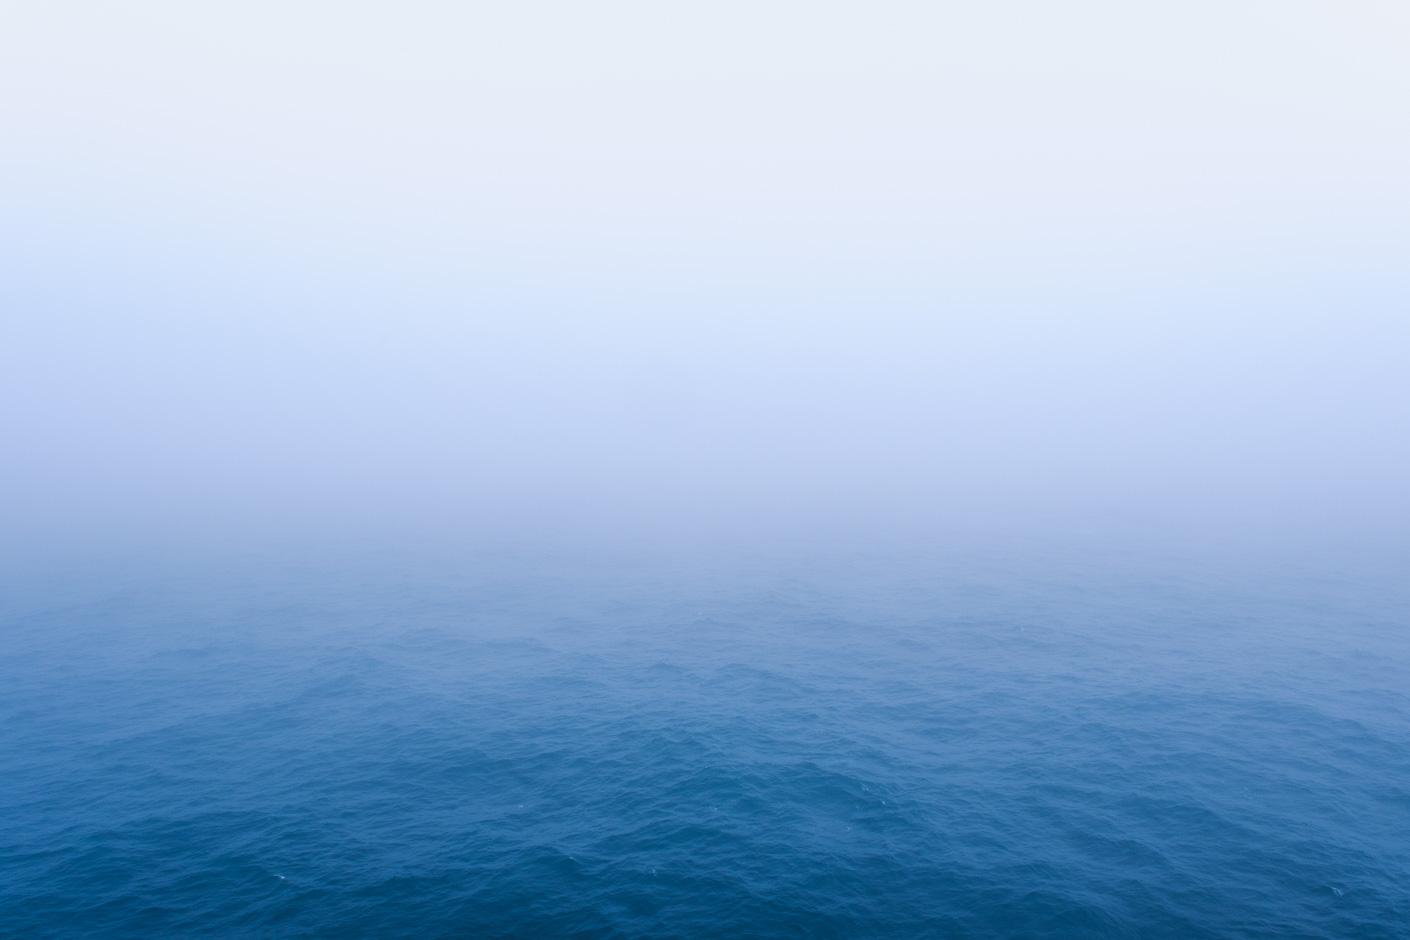 North Sea, 2016.